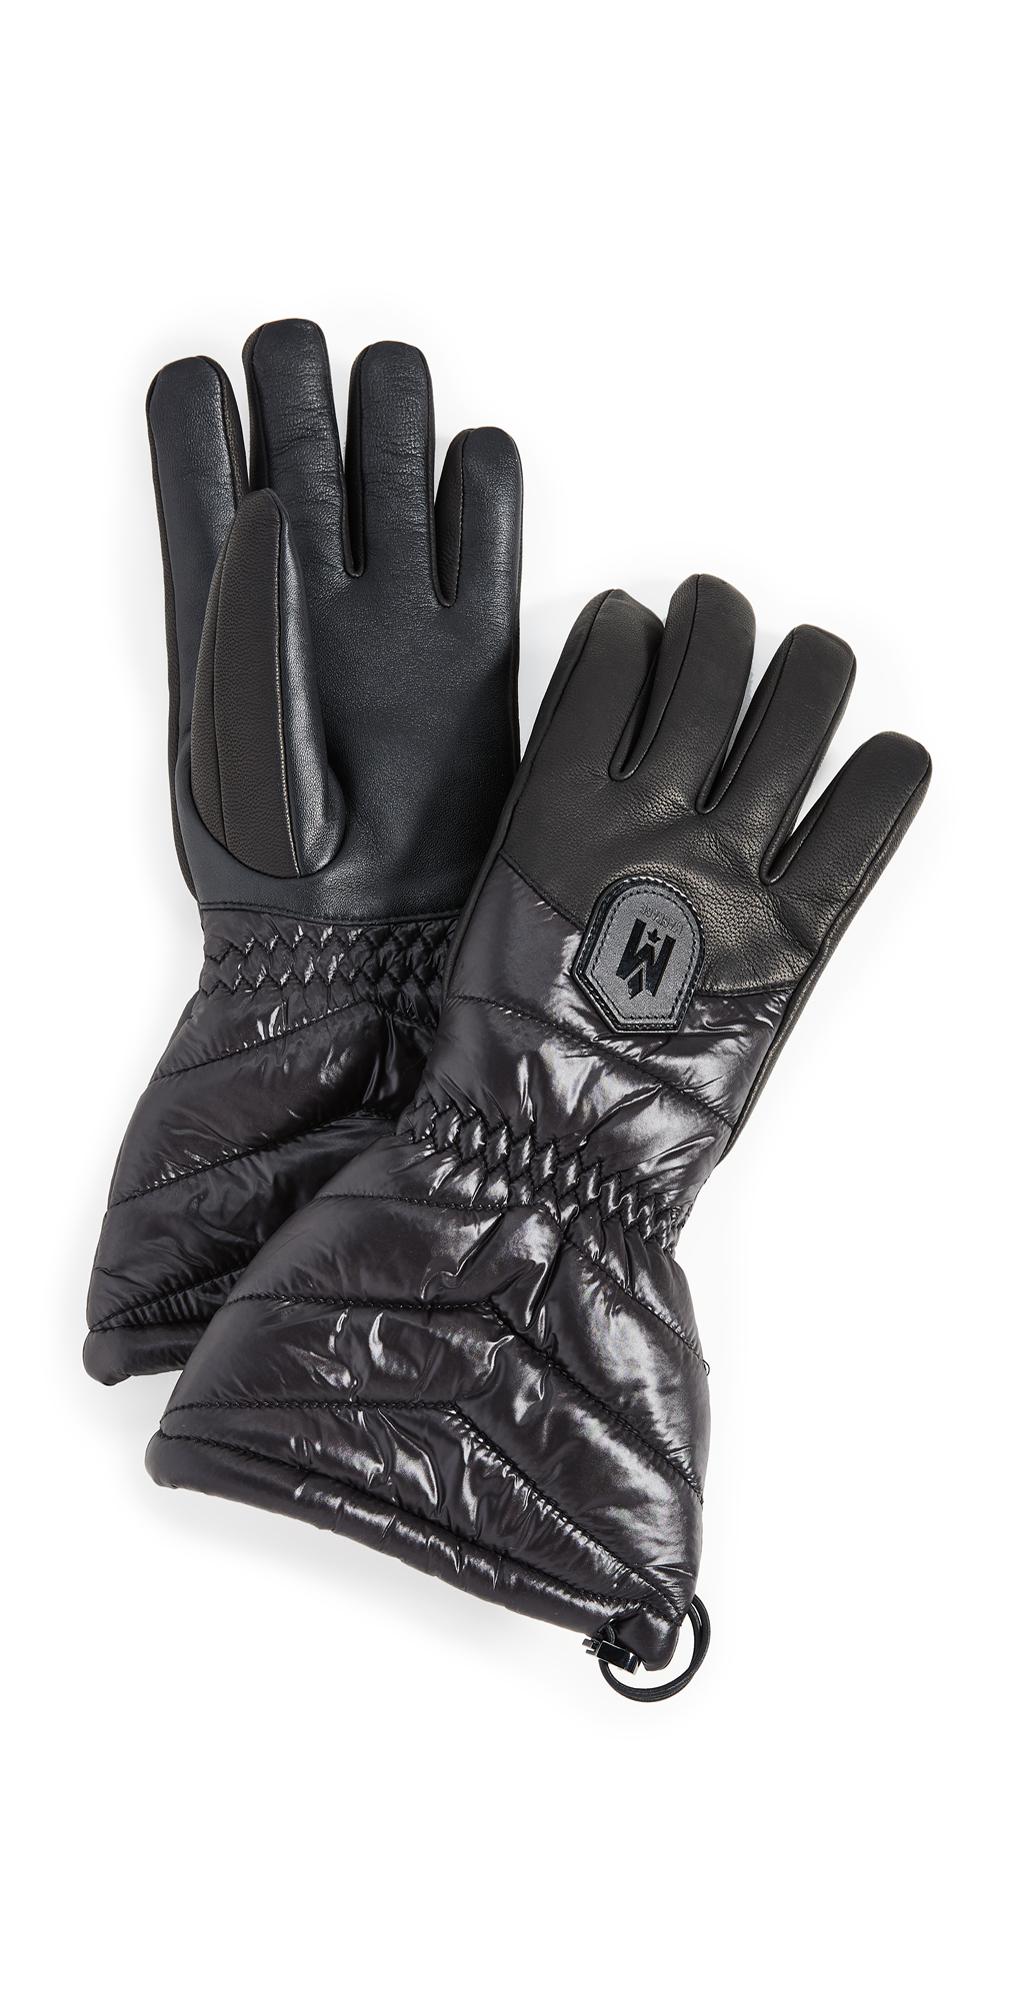 Mackage Adley Outdoor Gloves